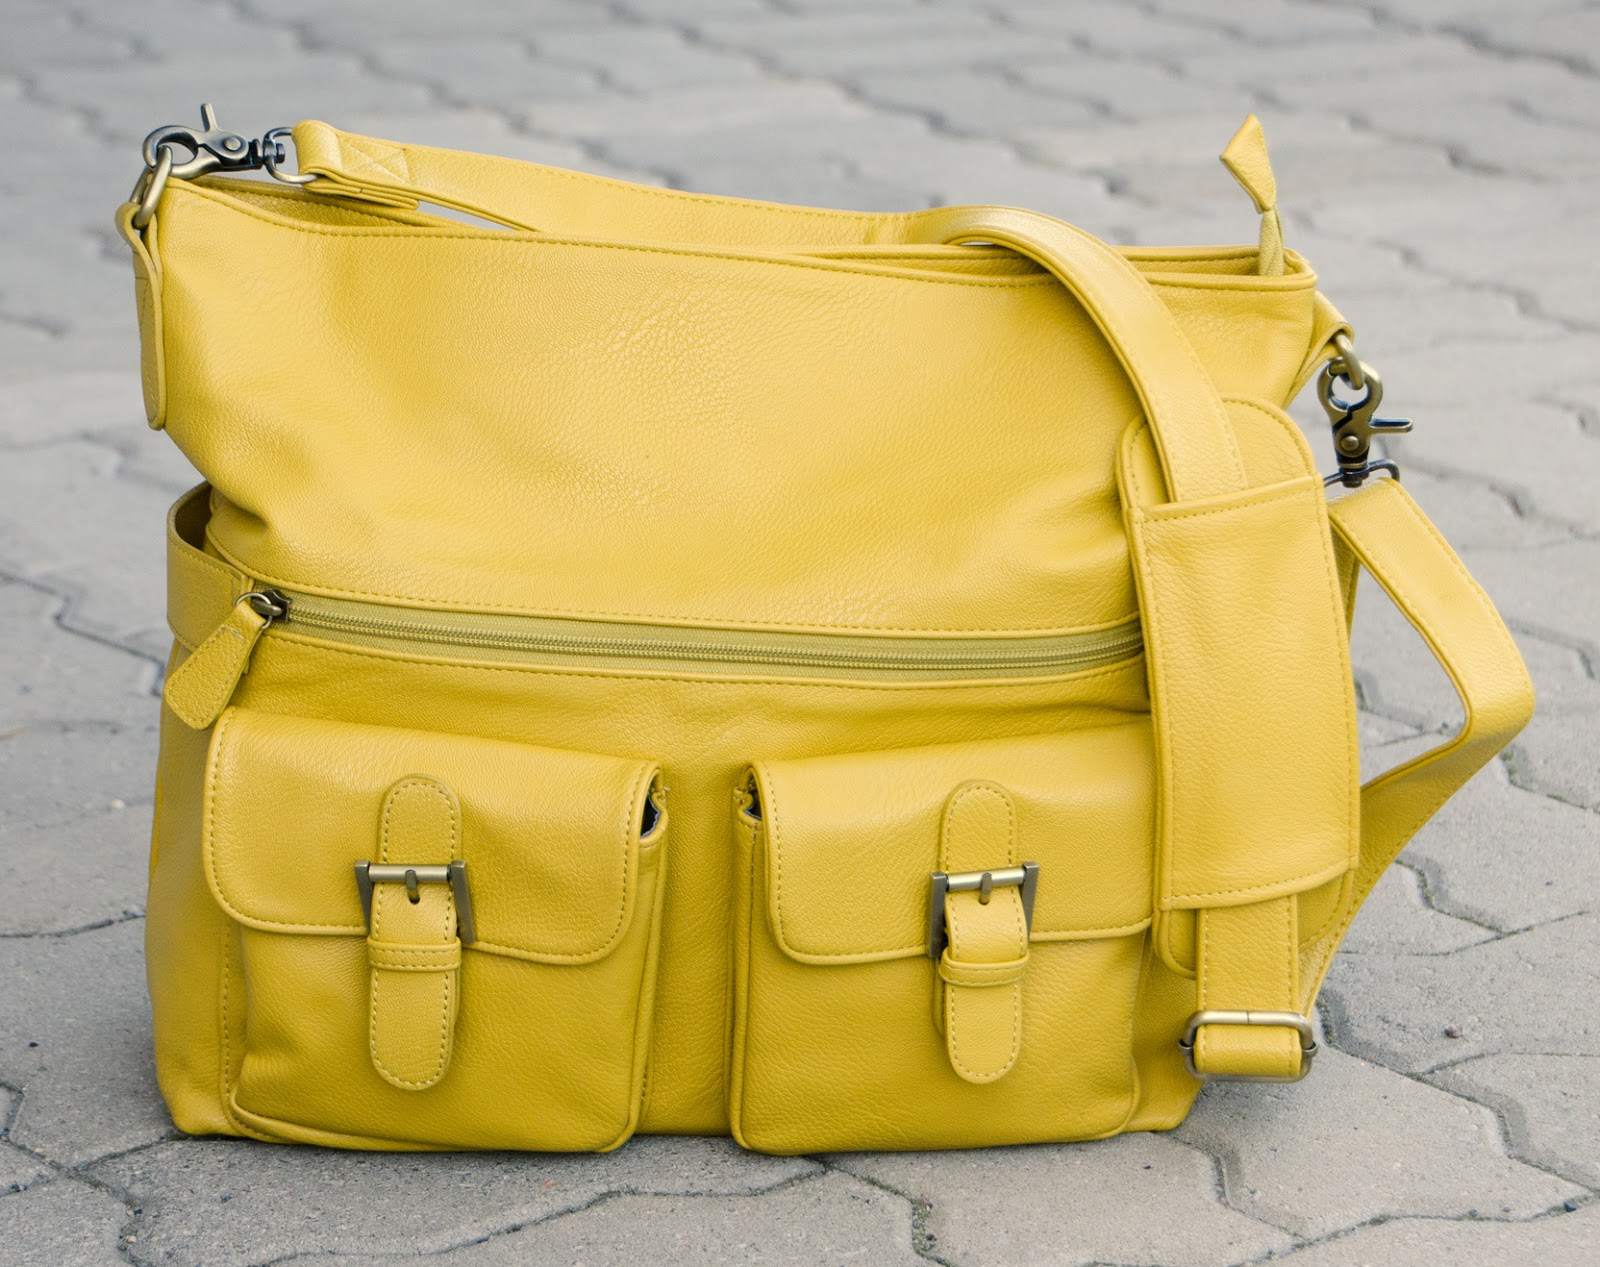 Stylish camera bag by Jo Totes